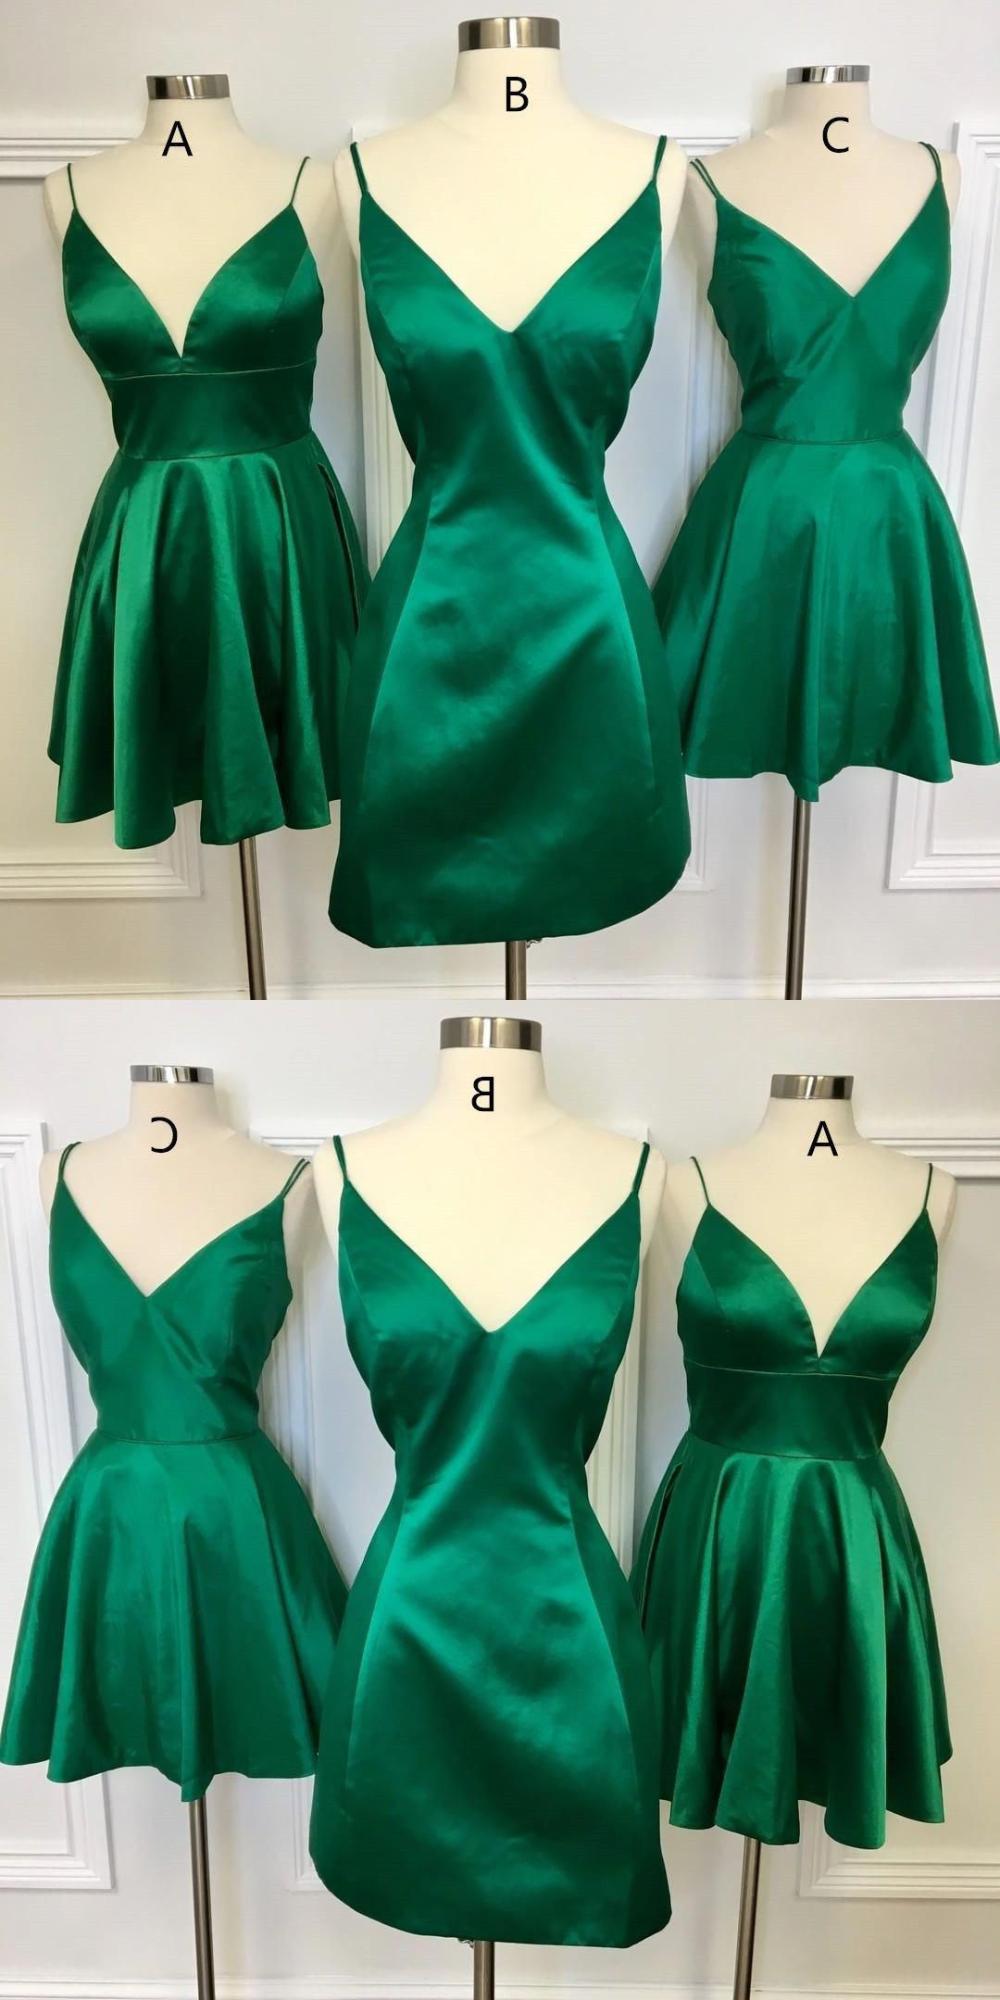 Simple A Line Short Homecoming Dresses Emerald Green Satin Hoco Dresses Cheap Ho Green Homecoming Dresses Cheap Homecoming Dresses Homecoming Dresses Under 100 [ 2000 x 1000 Pixel ]